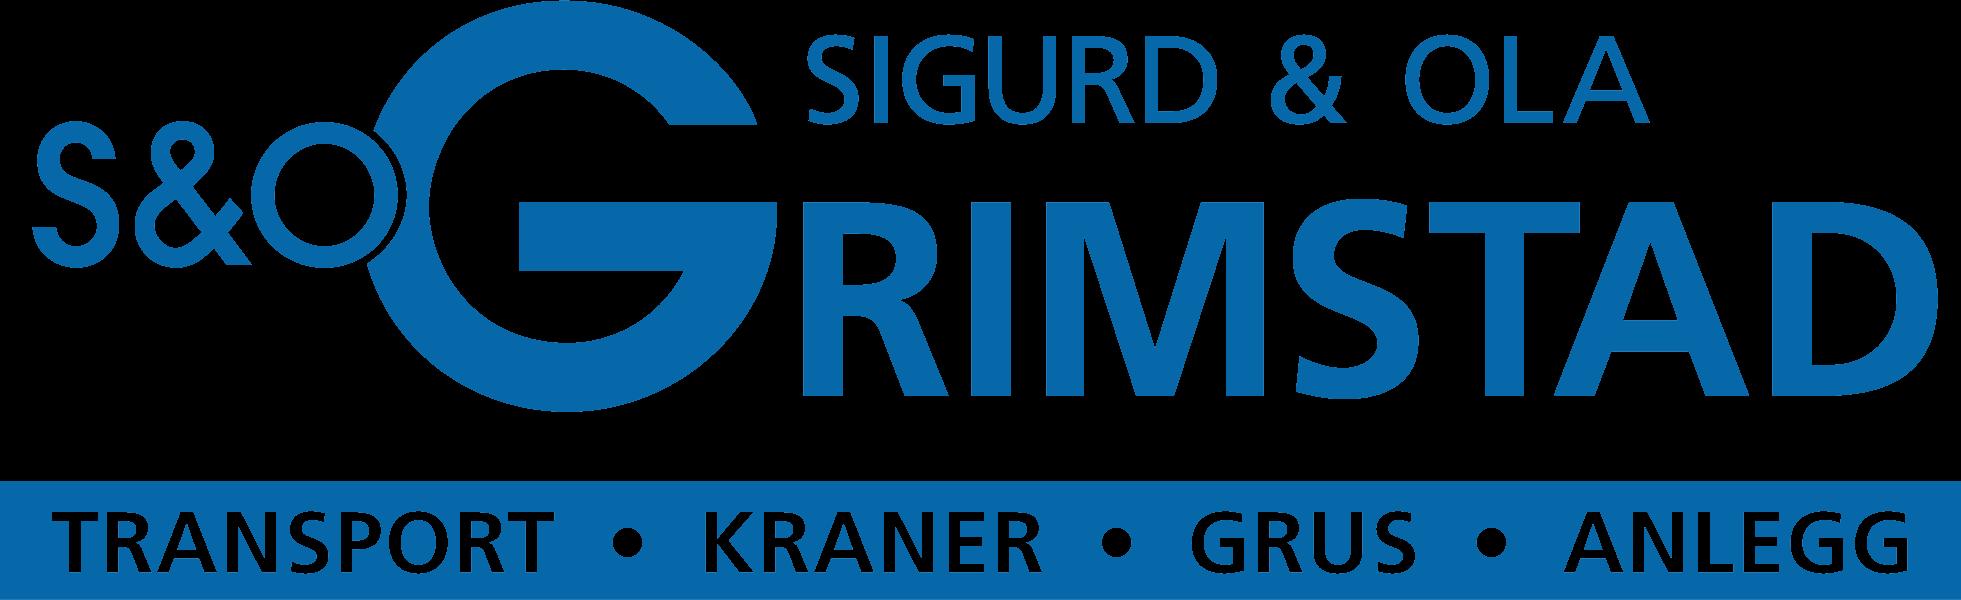 S & O Grimstad